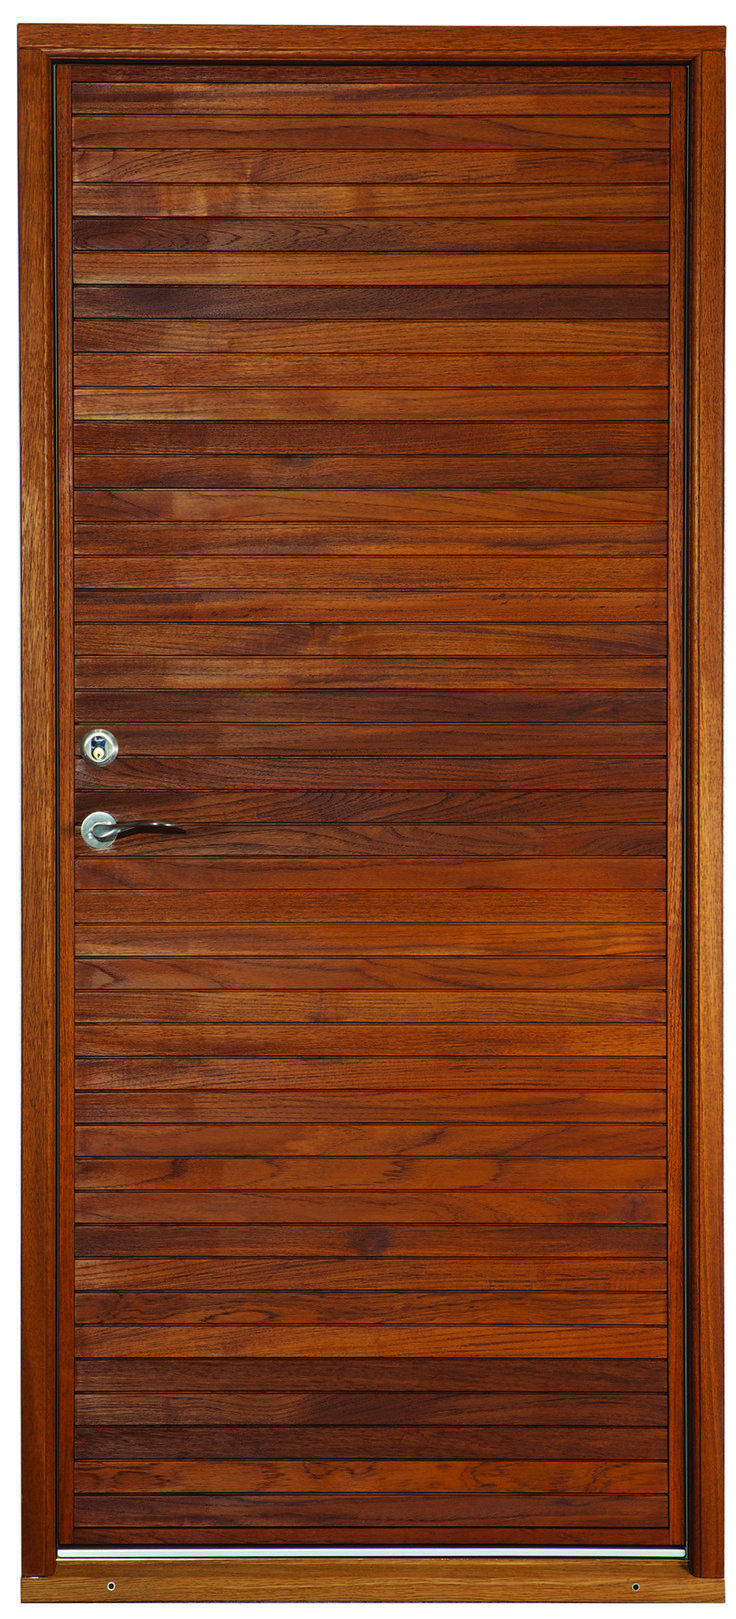 Aros - a modern design from our super secure Je-Trae entrance doors range